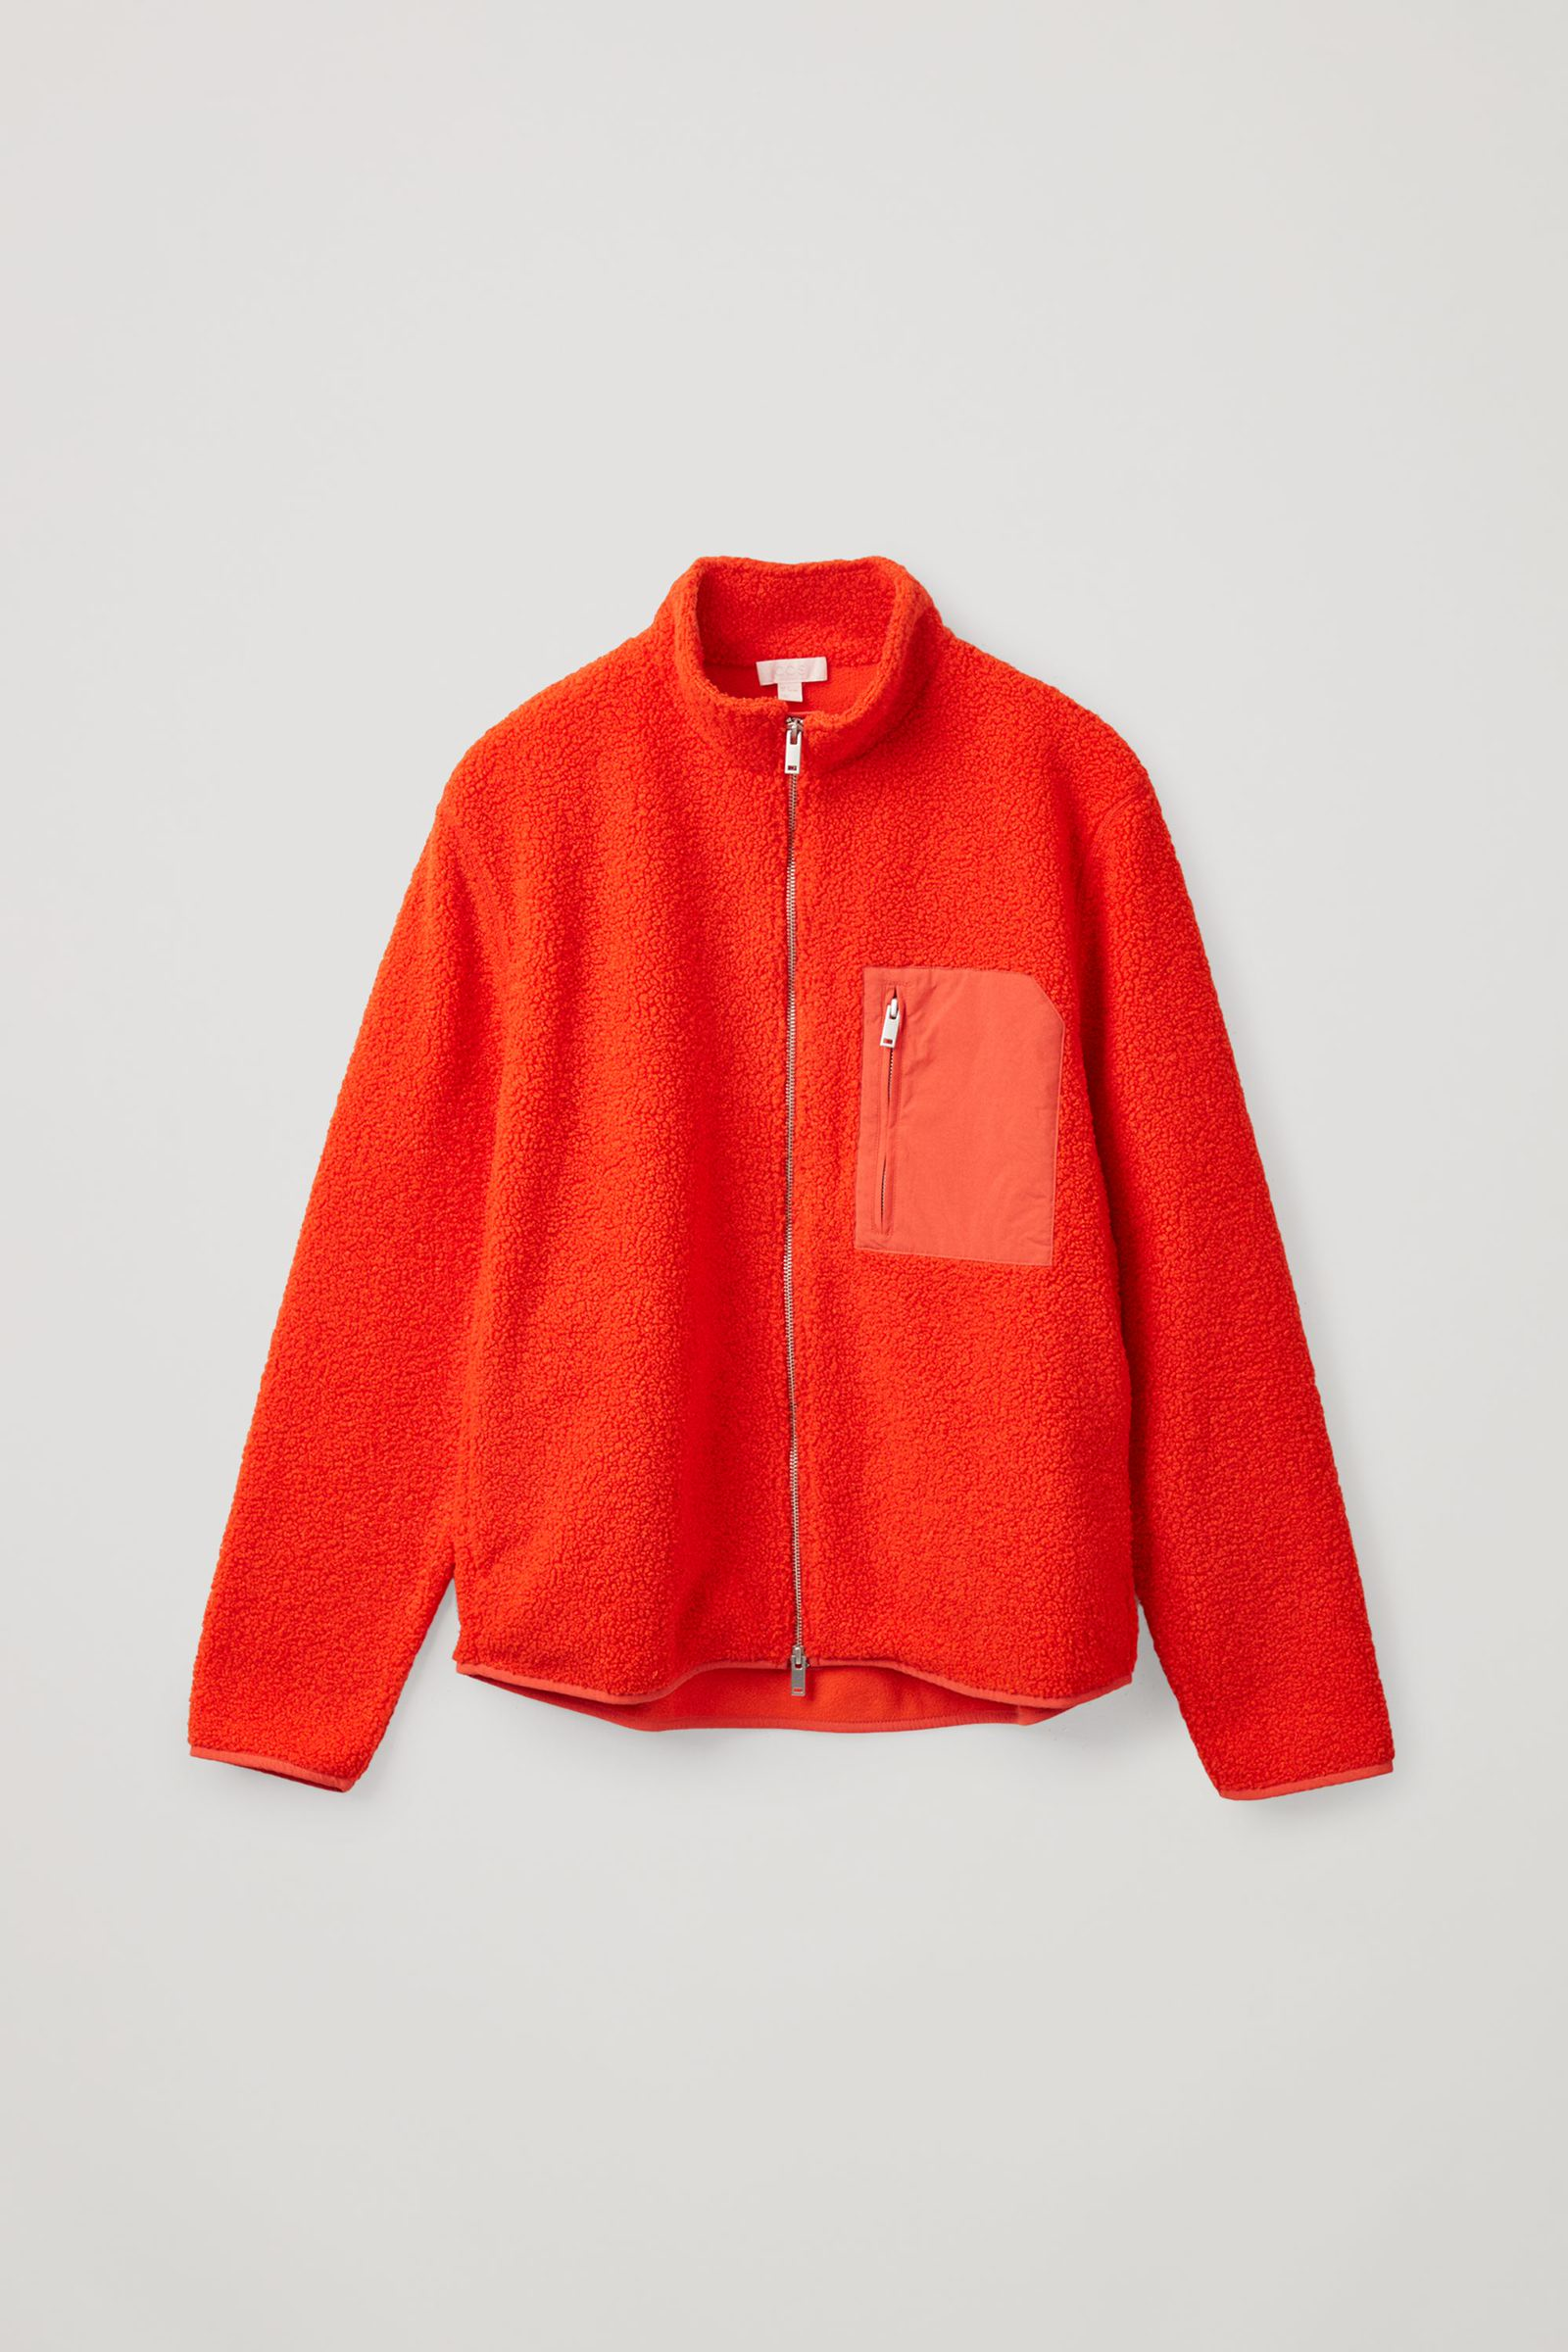 COS 테디 집업 재킷의 레드컬러 Product입니다.